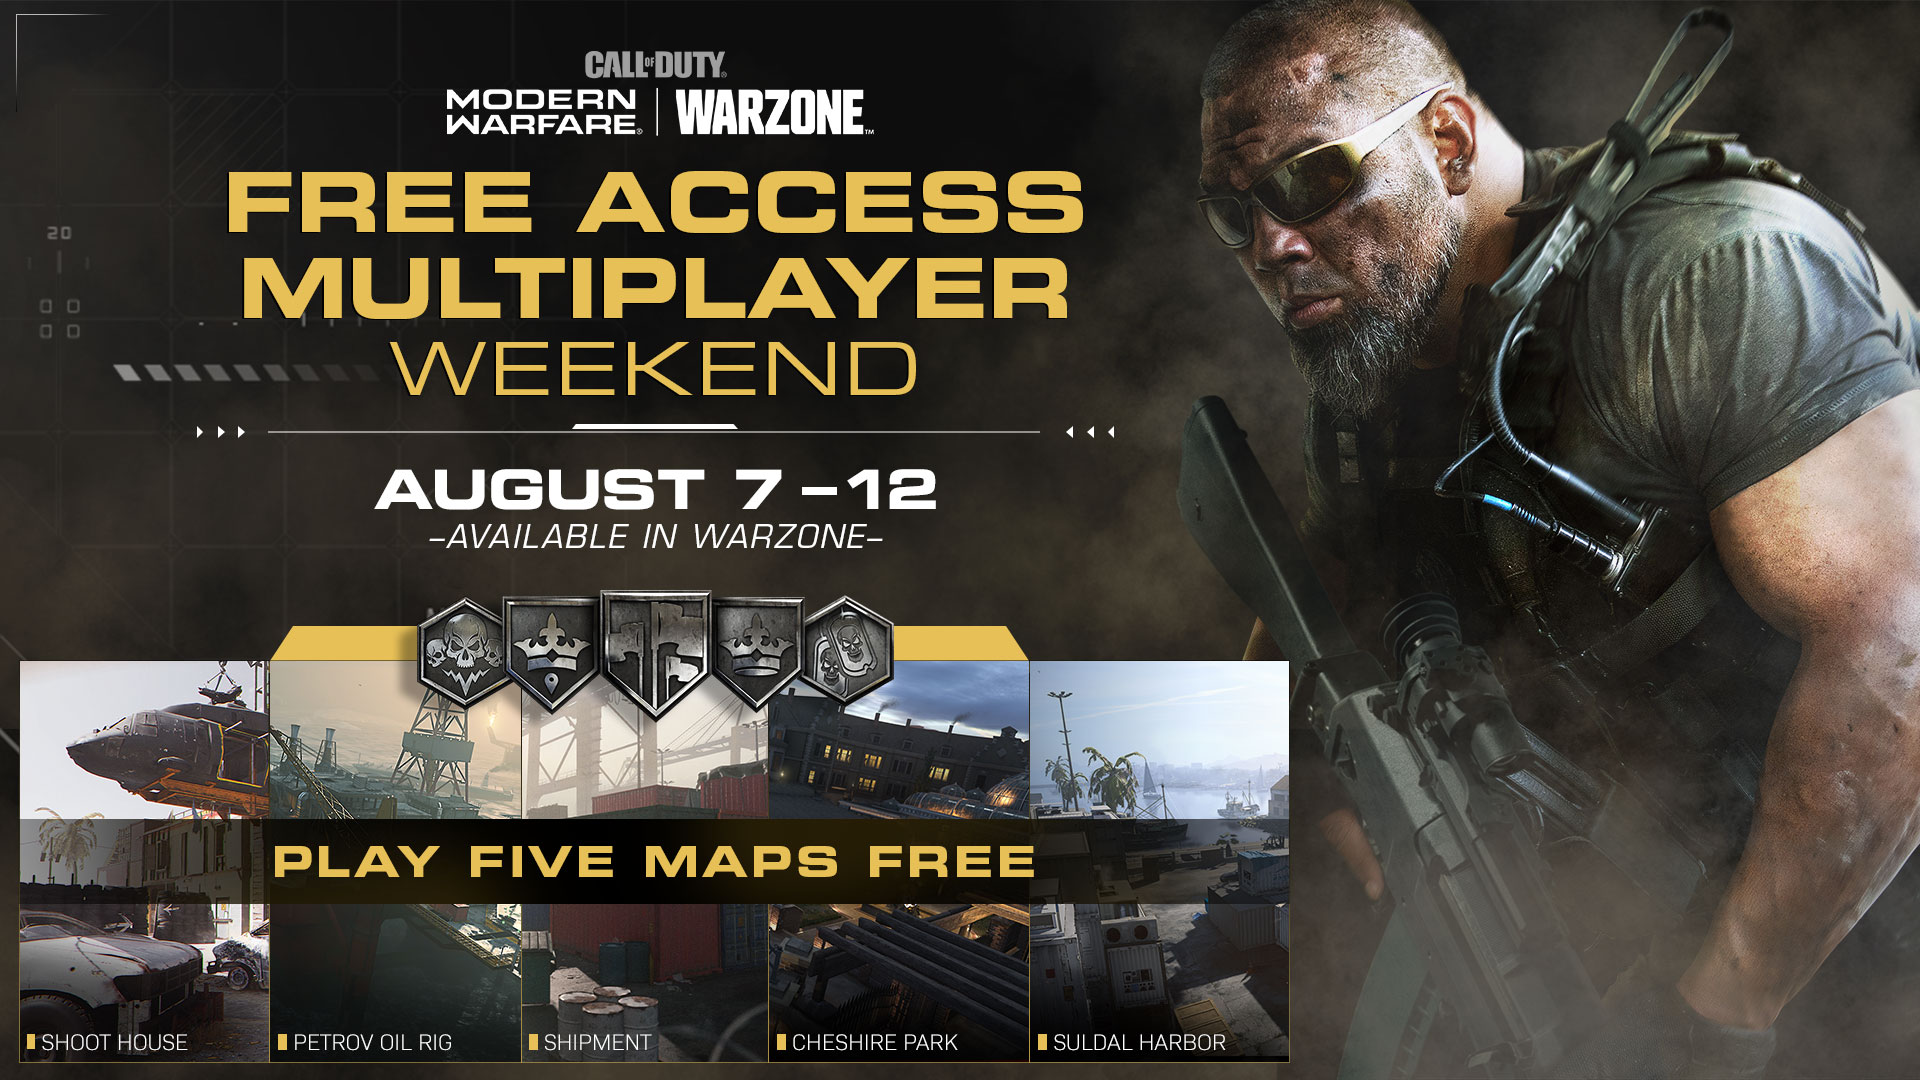 Free multiplayer weekend in Modern Warfare